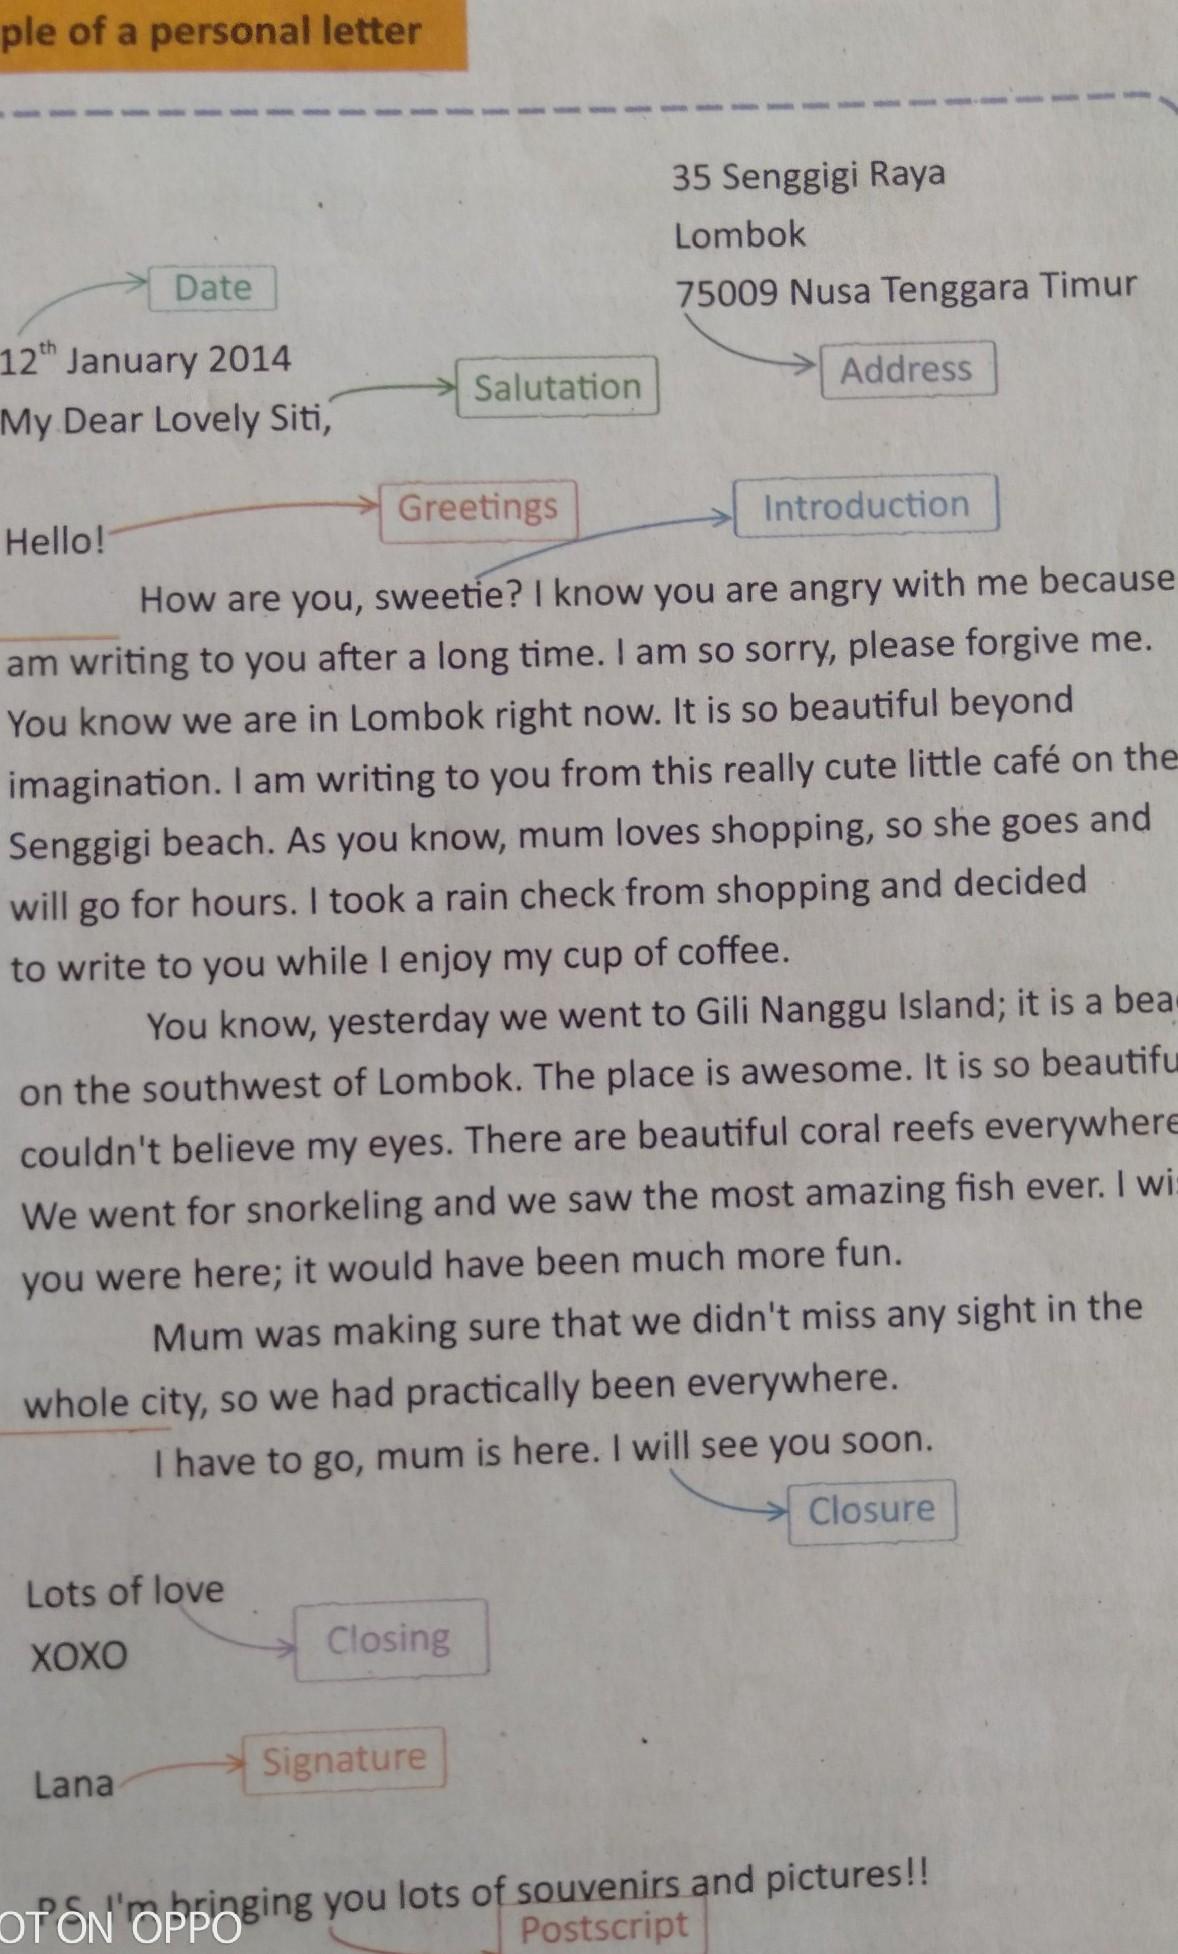 Balasan Surat My Dear Lovely Siti Brainly Co Id